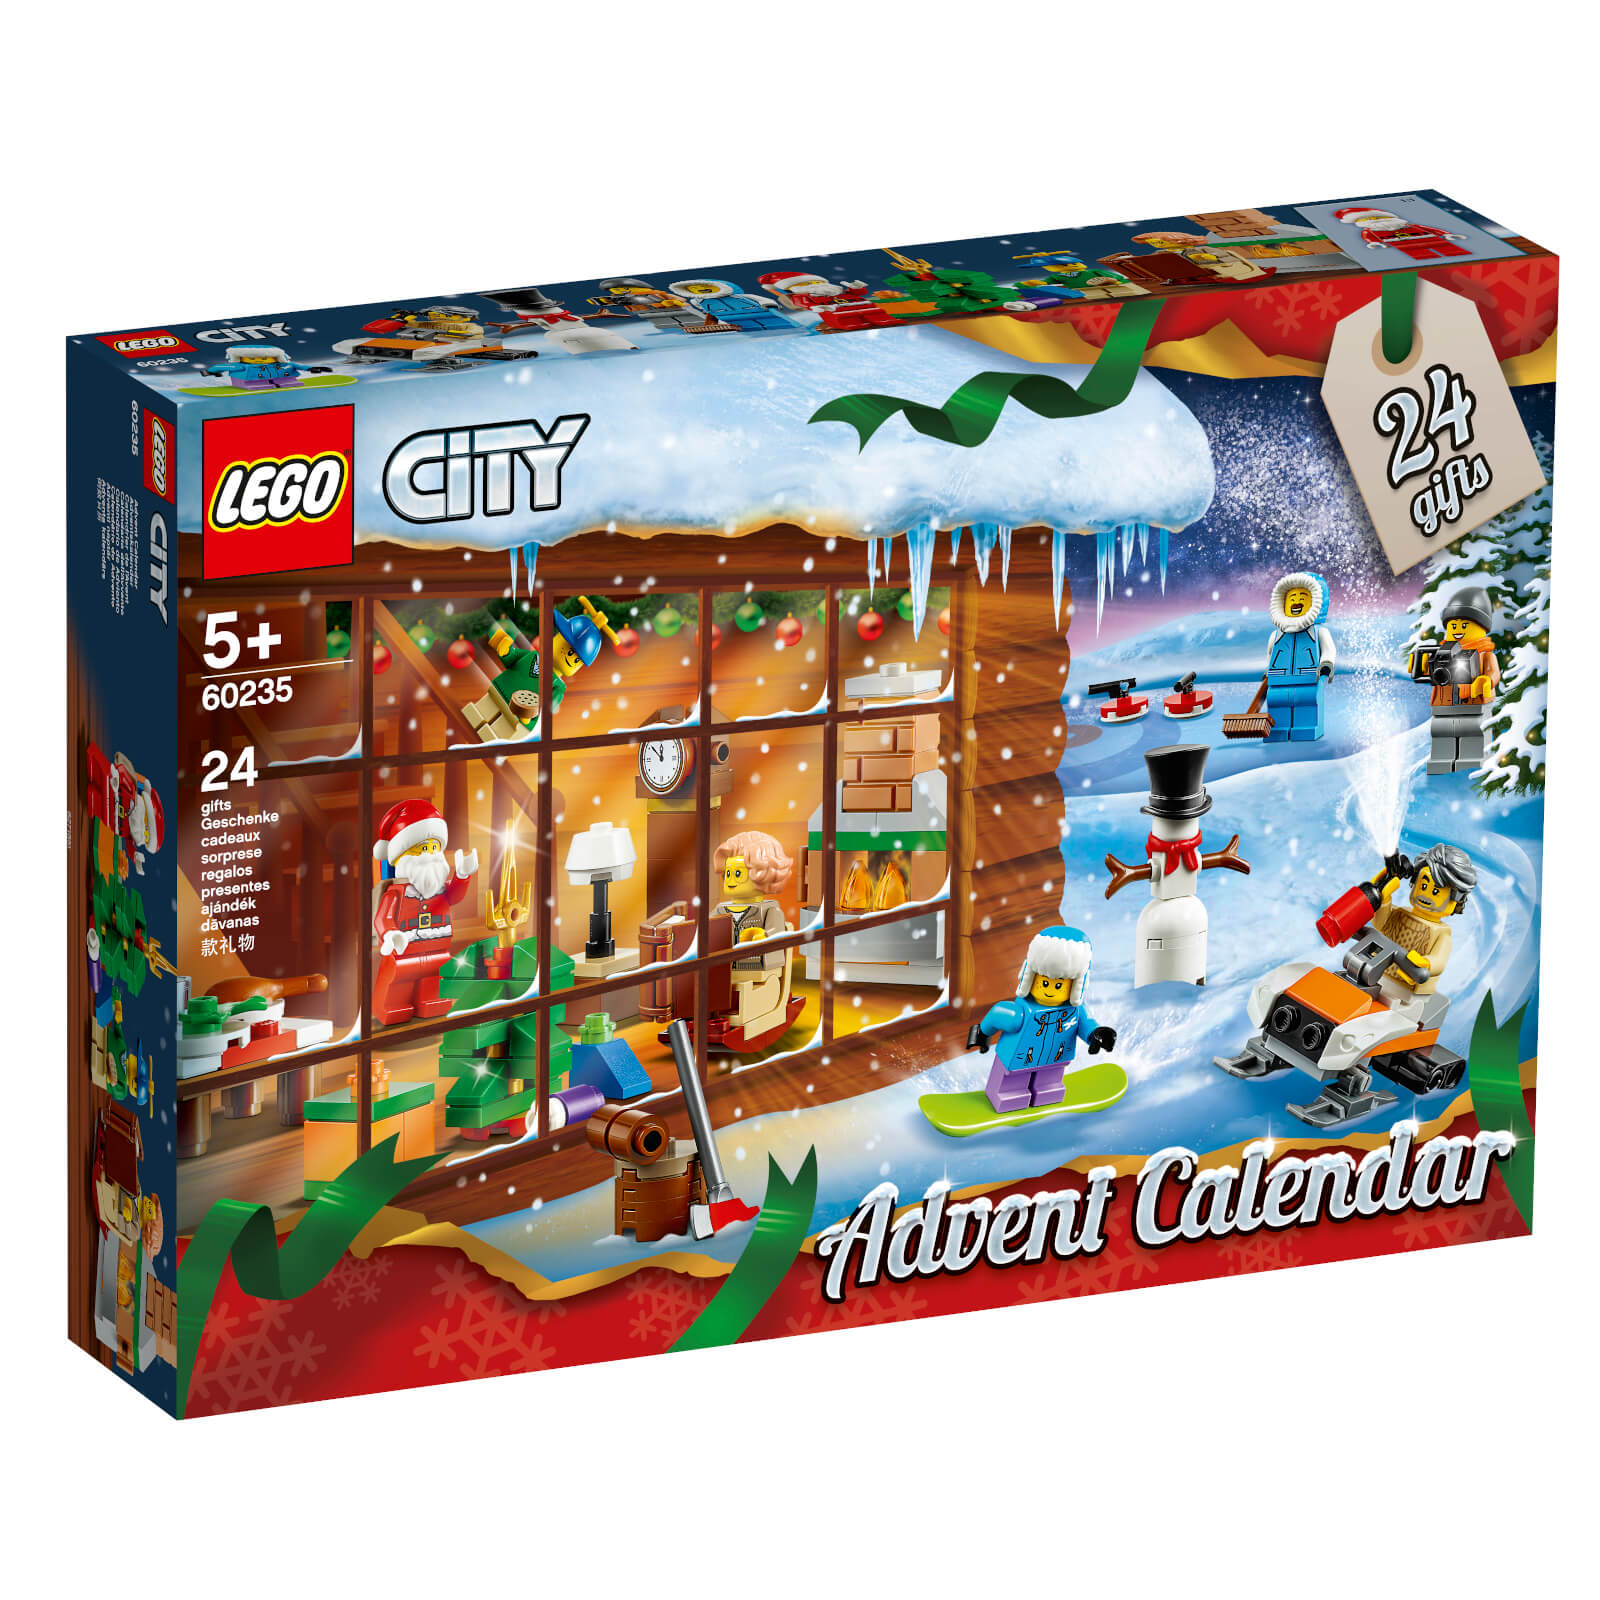 Image of LEGO City Town: City Advent Calendar (60235)